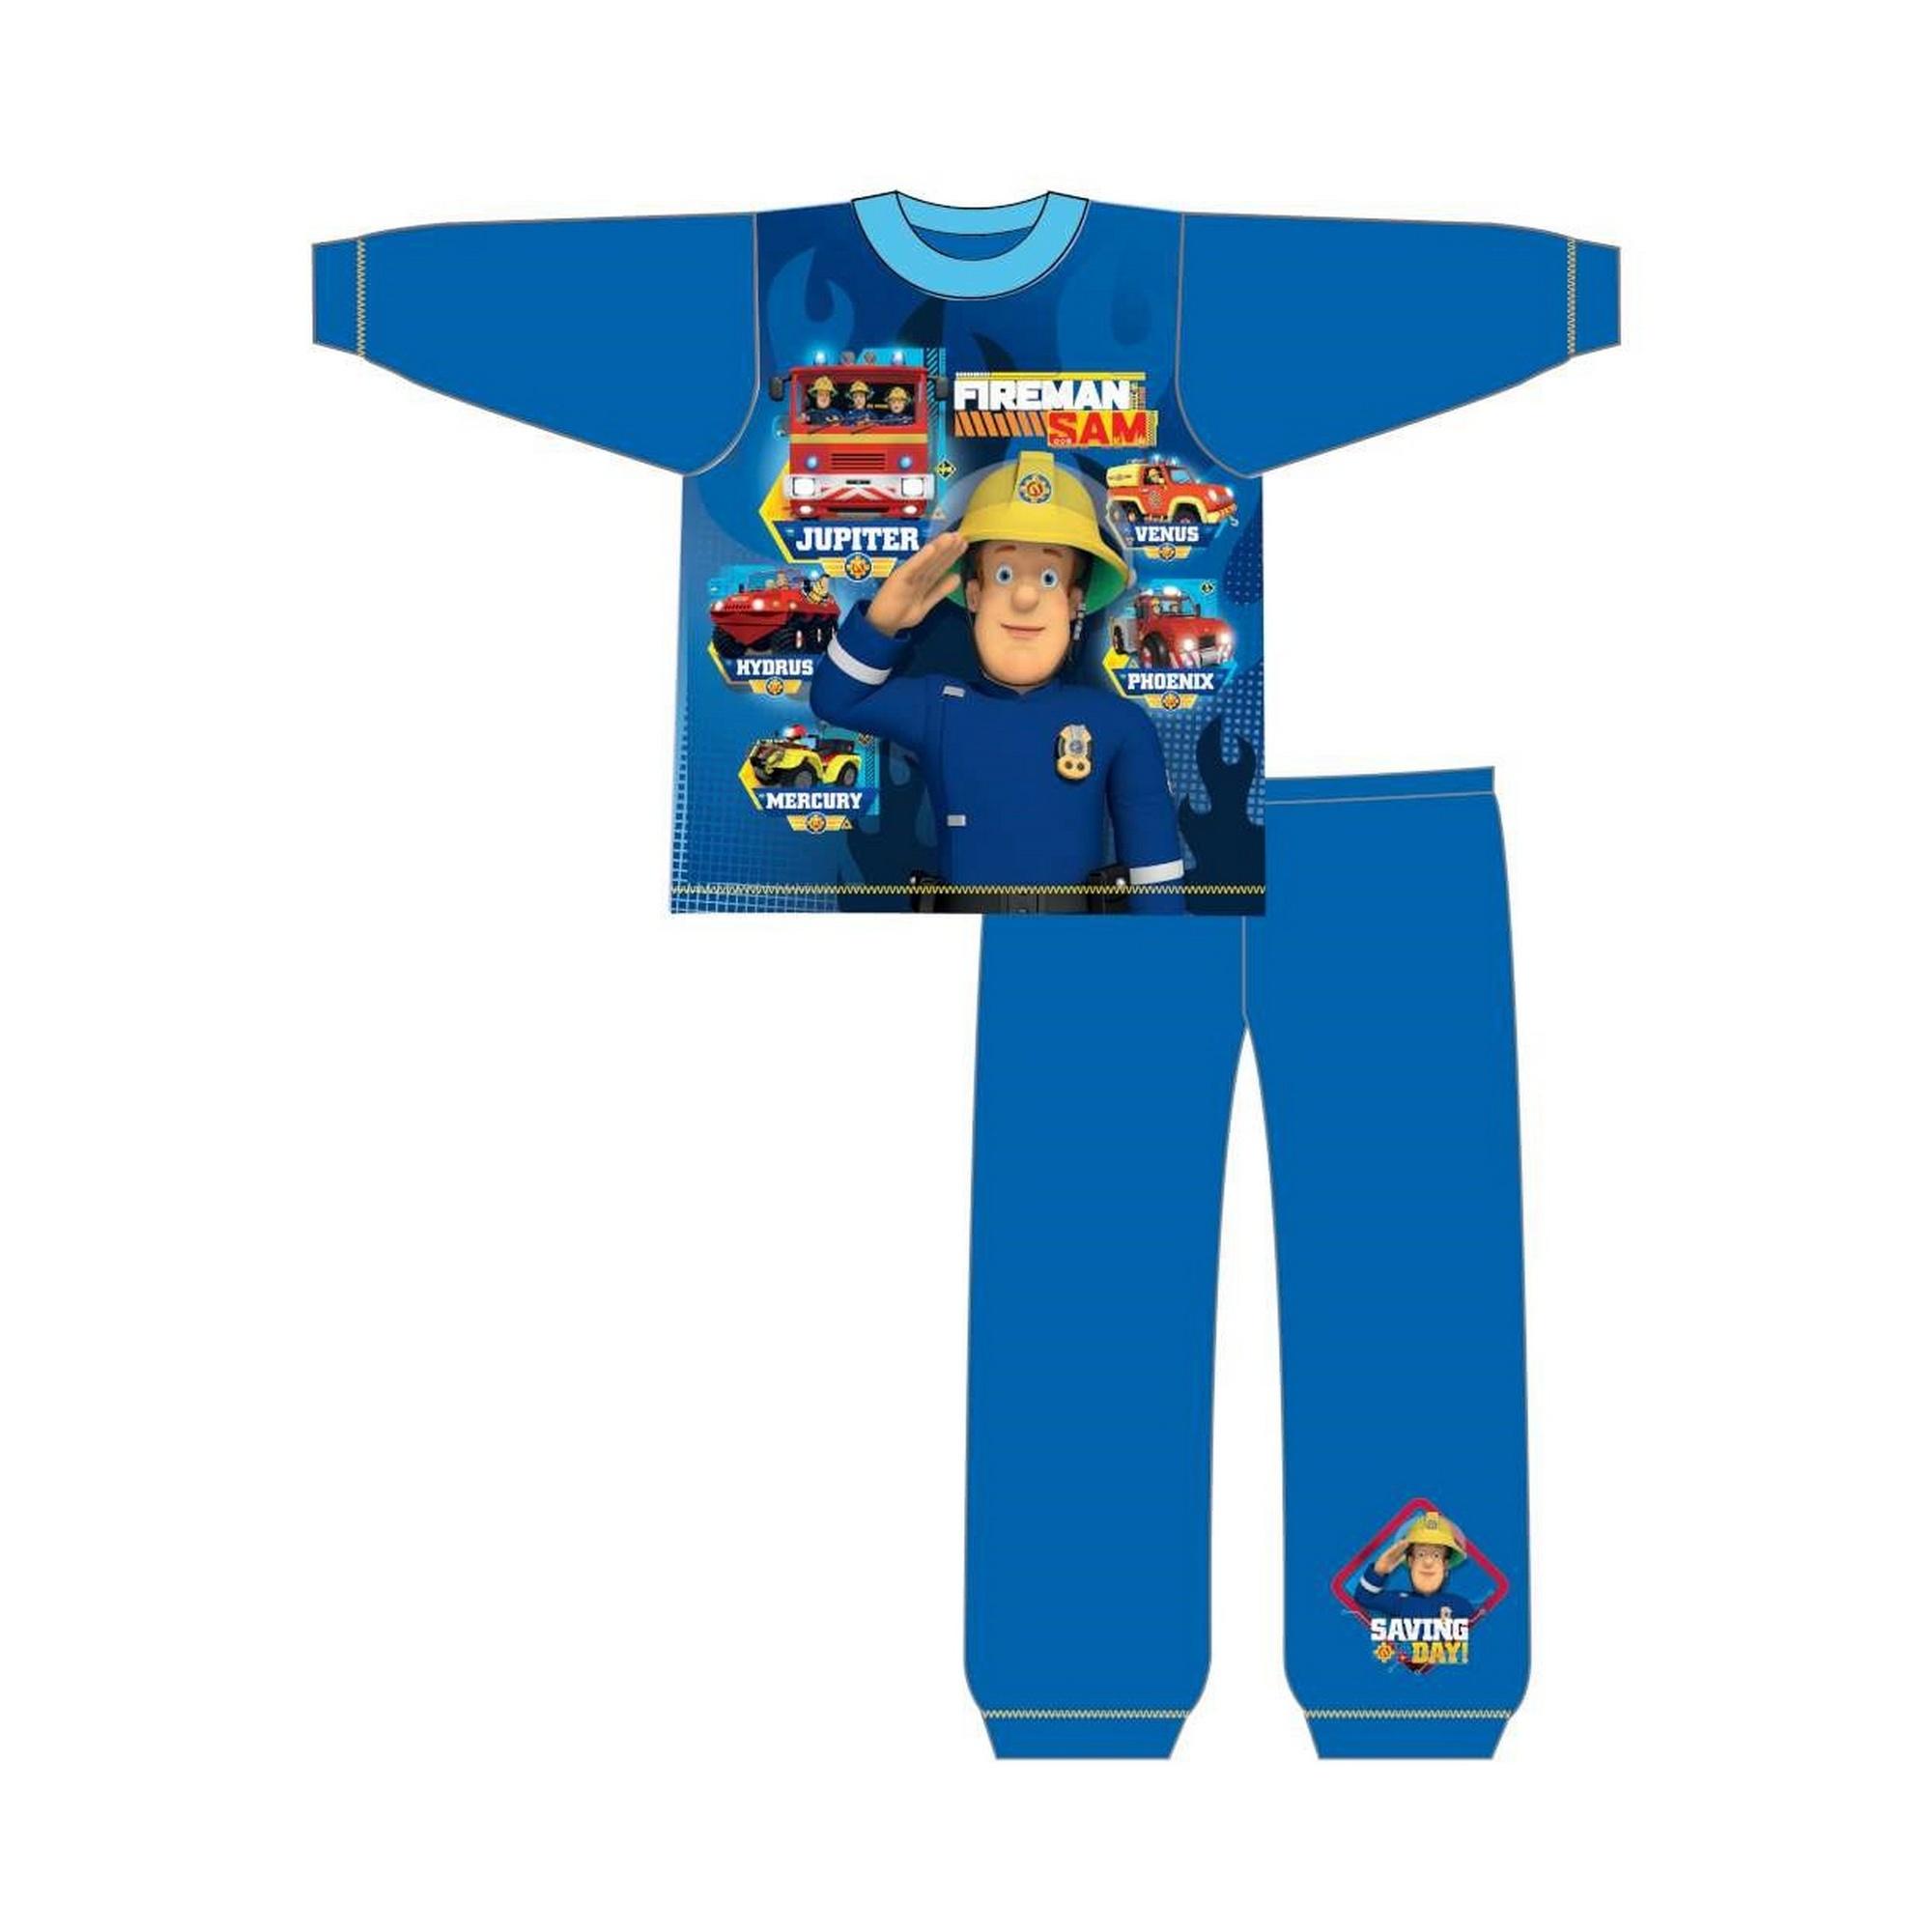 Fireman-Sam-Pijama-de-manga-larga-infantil-de-Sam-el-Bombero-TF532